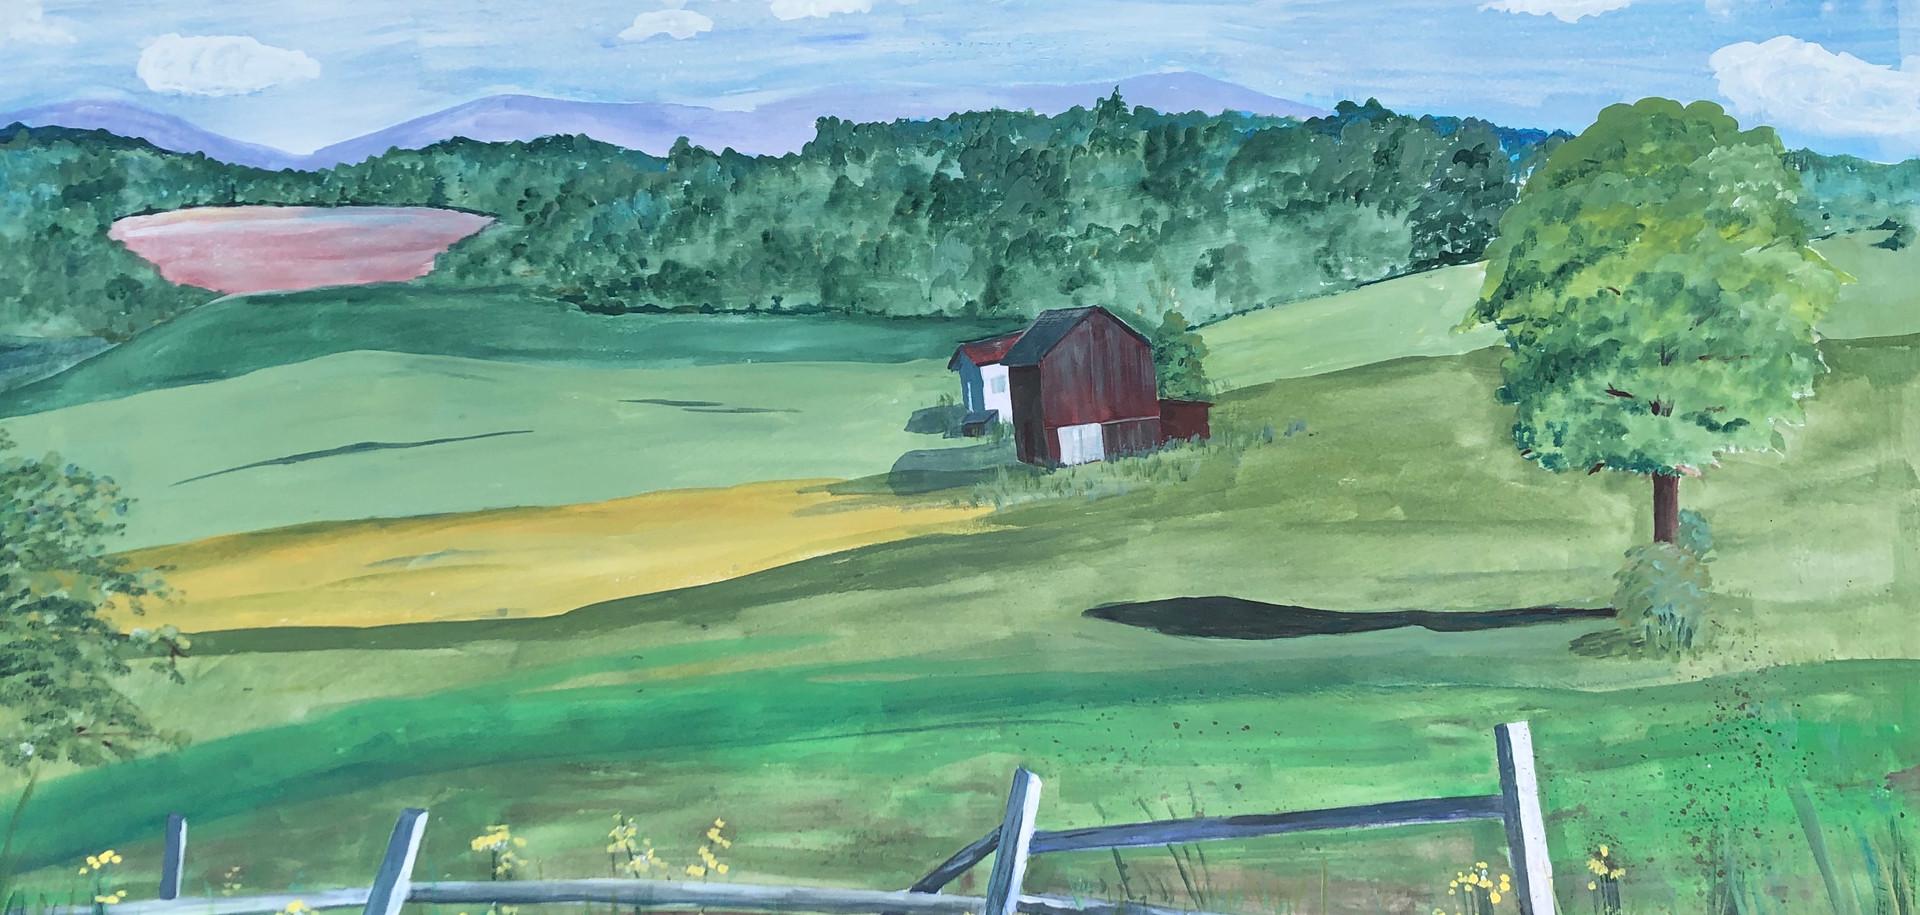 863 - PA farmland.jpeg